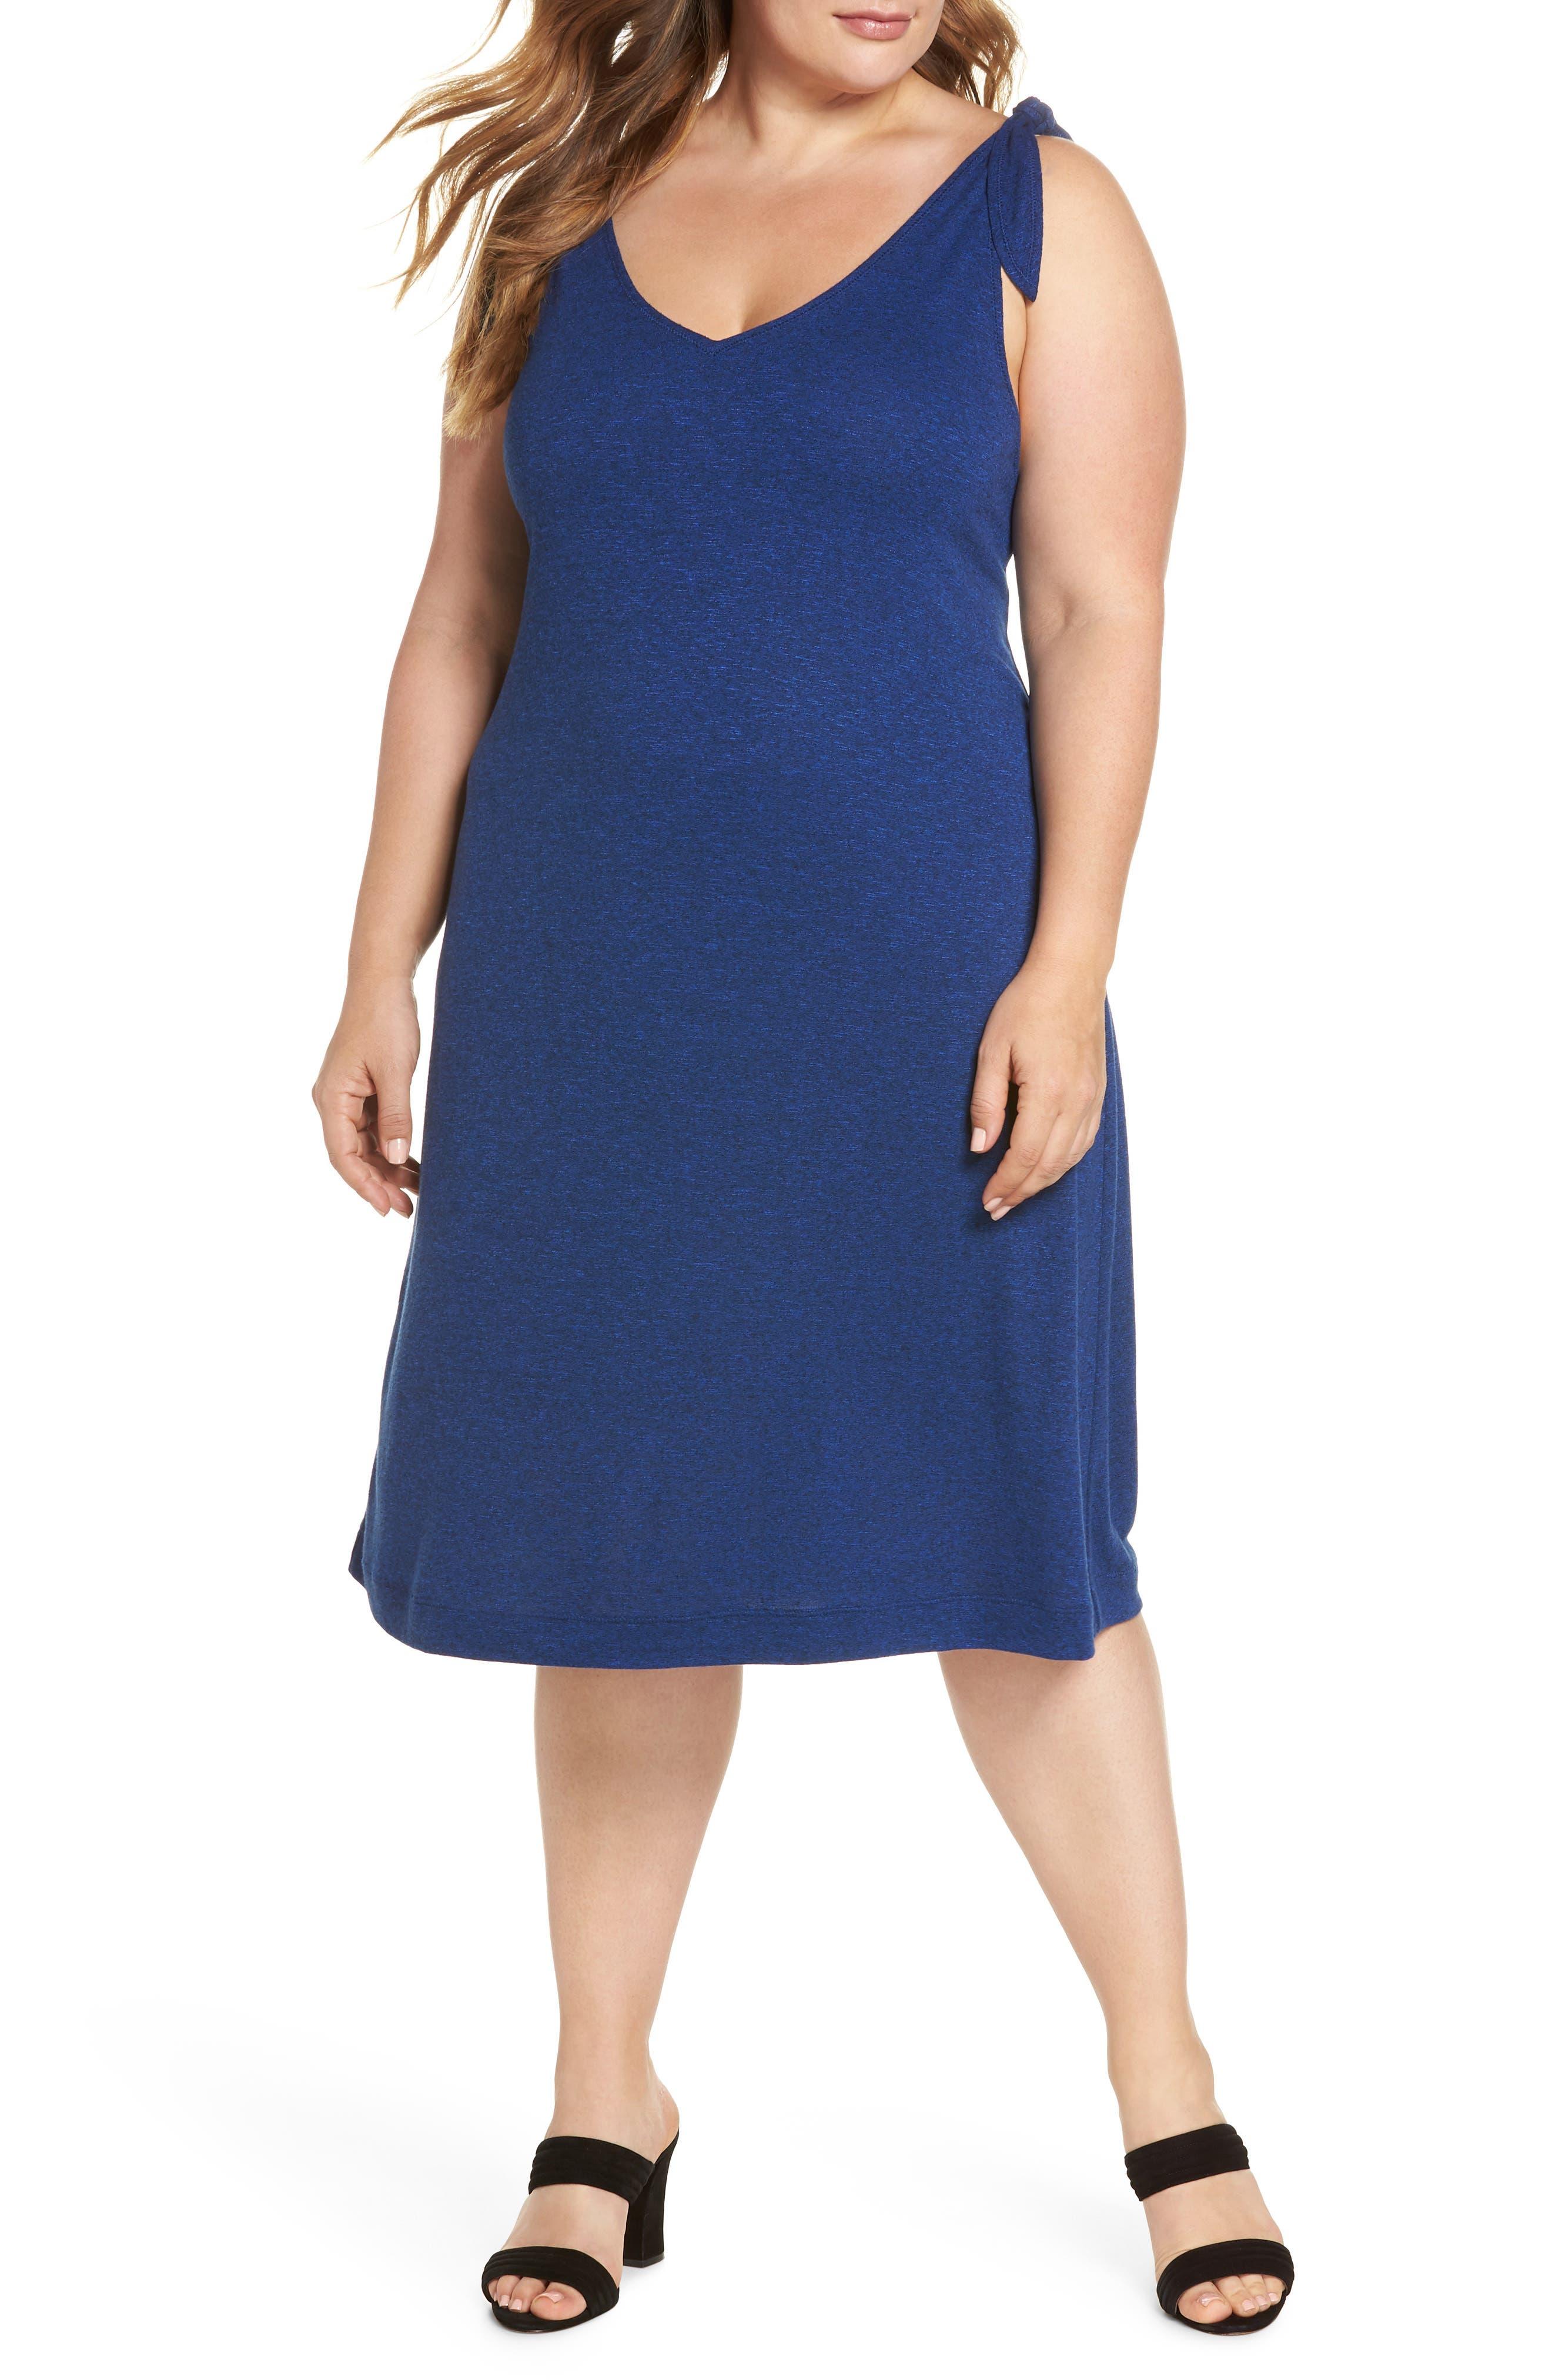 Knot Strap Knit Swing Dress,                             Main thumbnail 1, color,                             Cobalt Blue Slub Terry